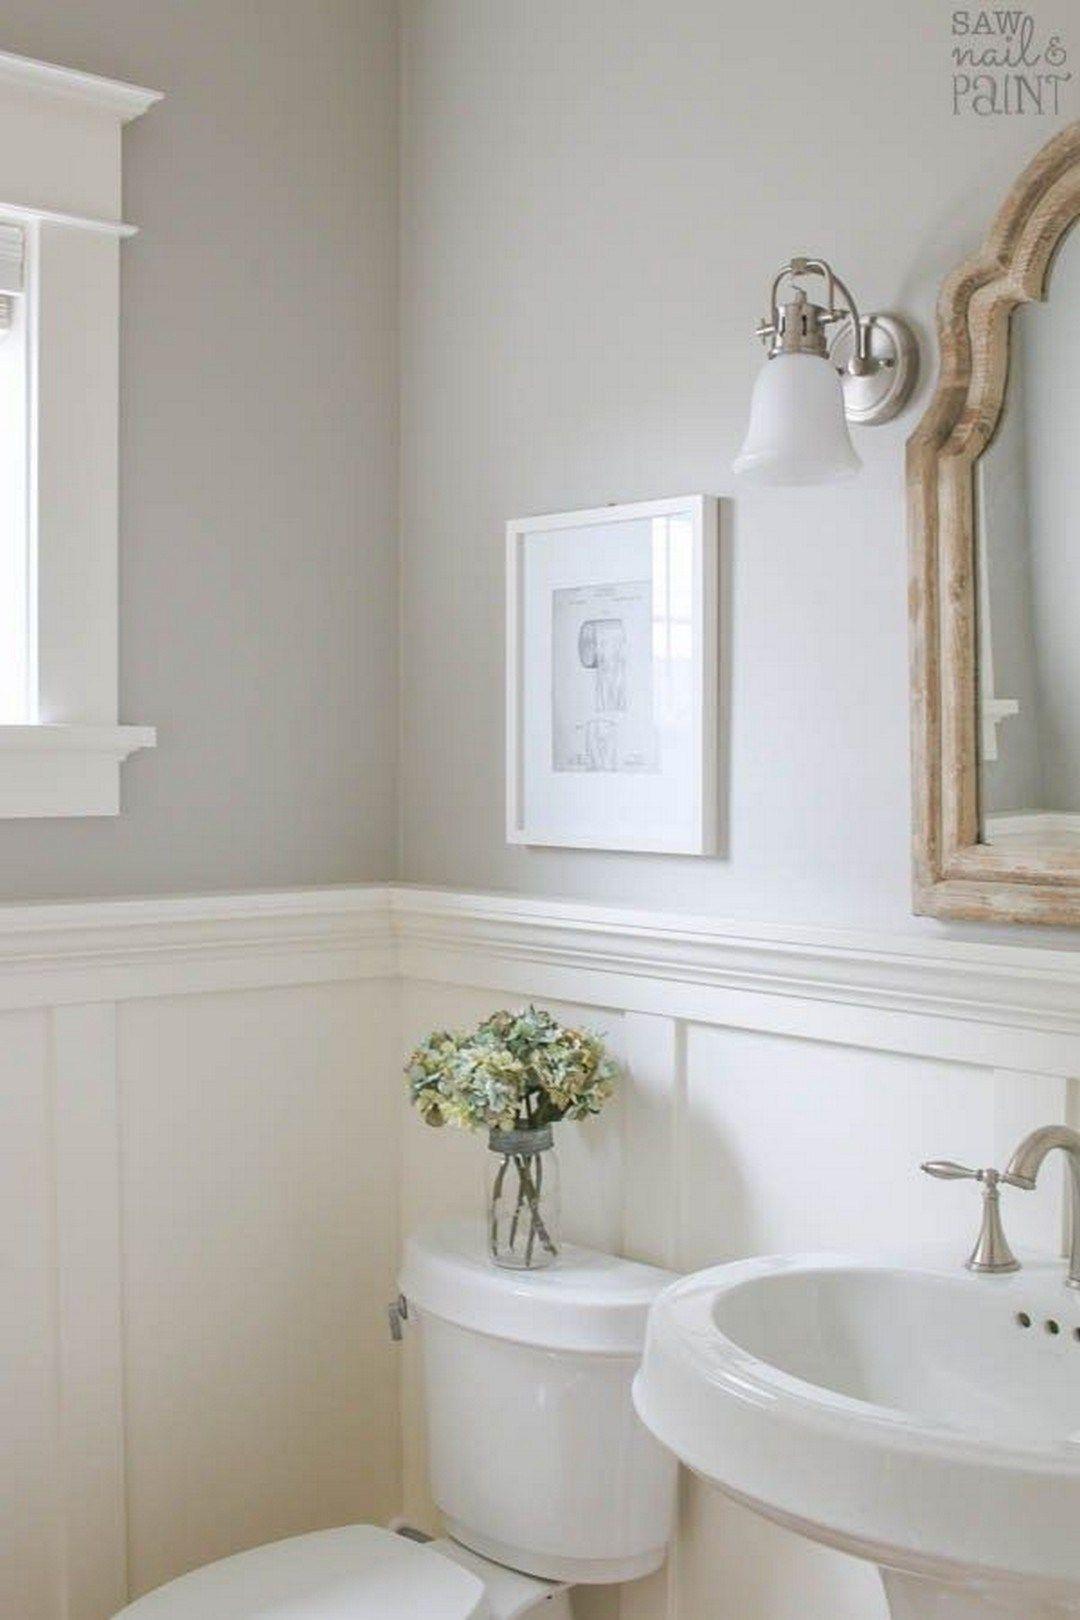 Fresh Neutral Color Scheme For Modern Interior Design (32